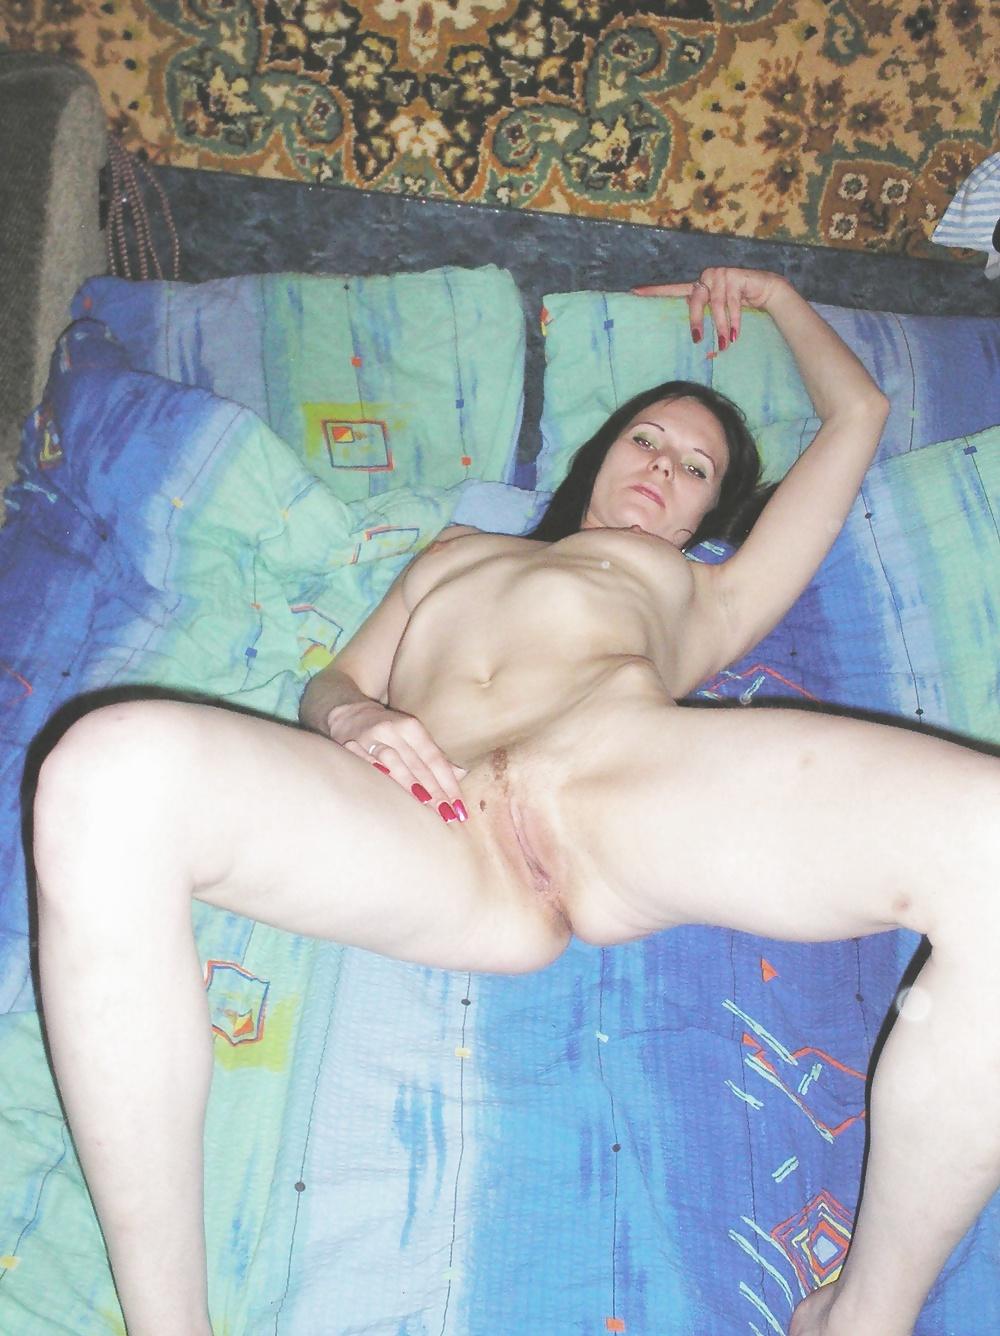 foto-domashnie-eroticheskie-v-siktivkare-eroticheskie-kazusi-zvezd-video